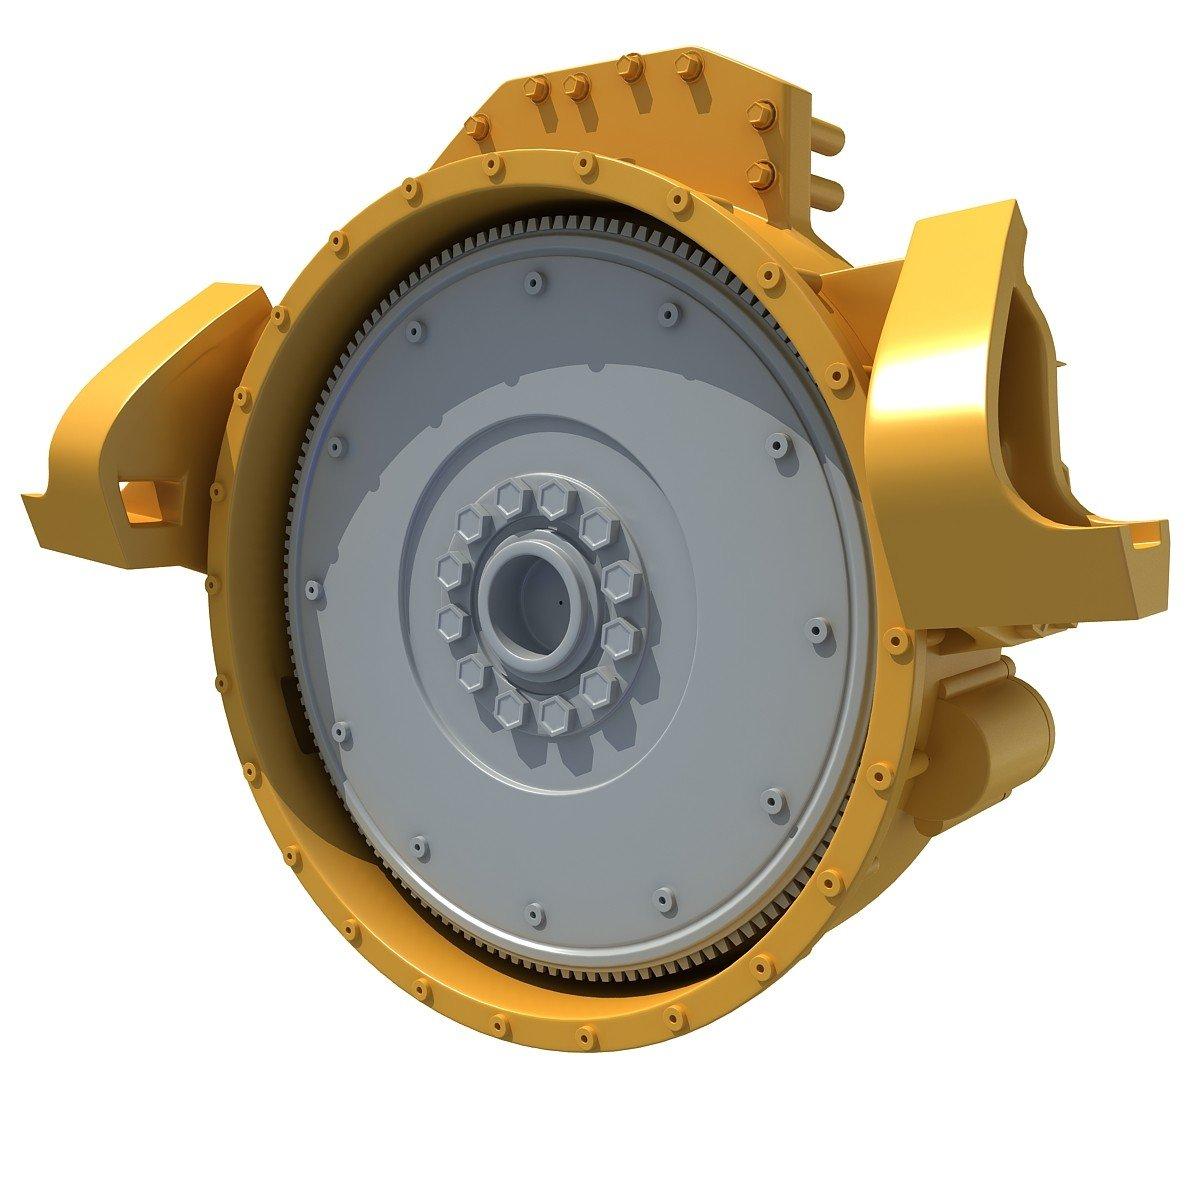 3D Engine Parts  #3D #3dEngine #3dParts https://www.3dhorse.com/collections/3d-engines/products/3d-engine-parts-models-1…pic.twitter.com/SRbJ7hAq4G